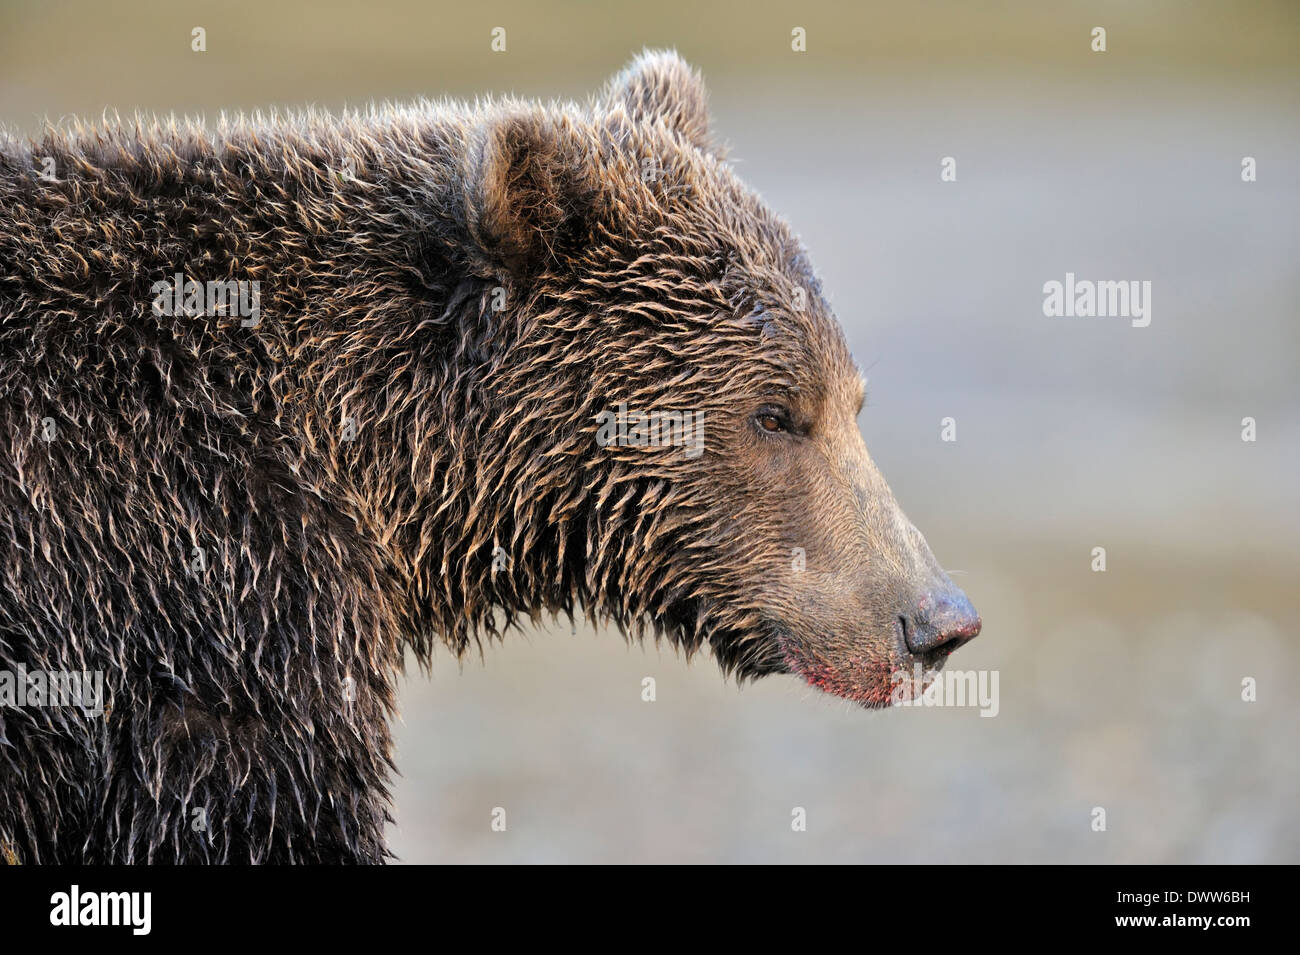 Grizzly Bär (Ursus Arctos Horribilis) Porträt. Stockbild